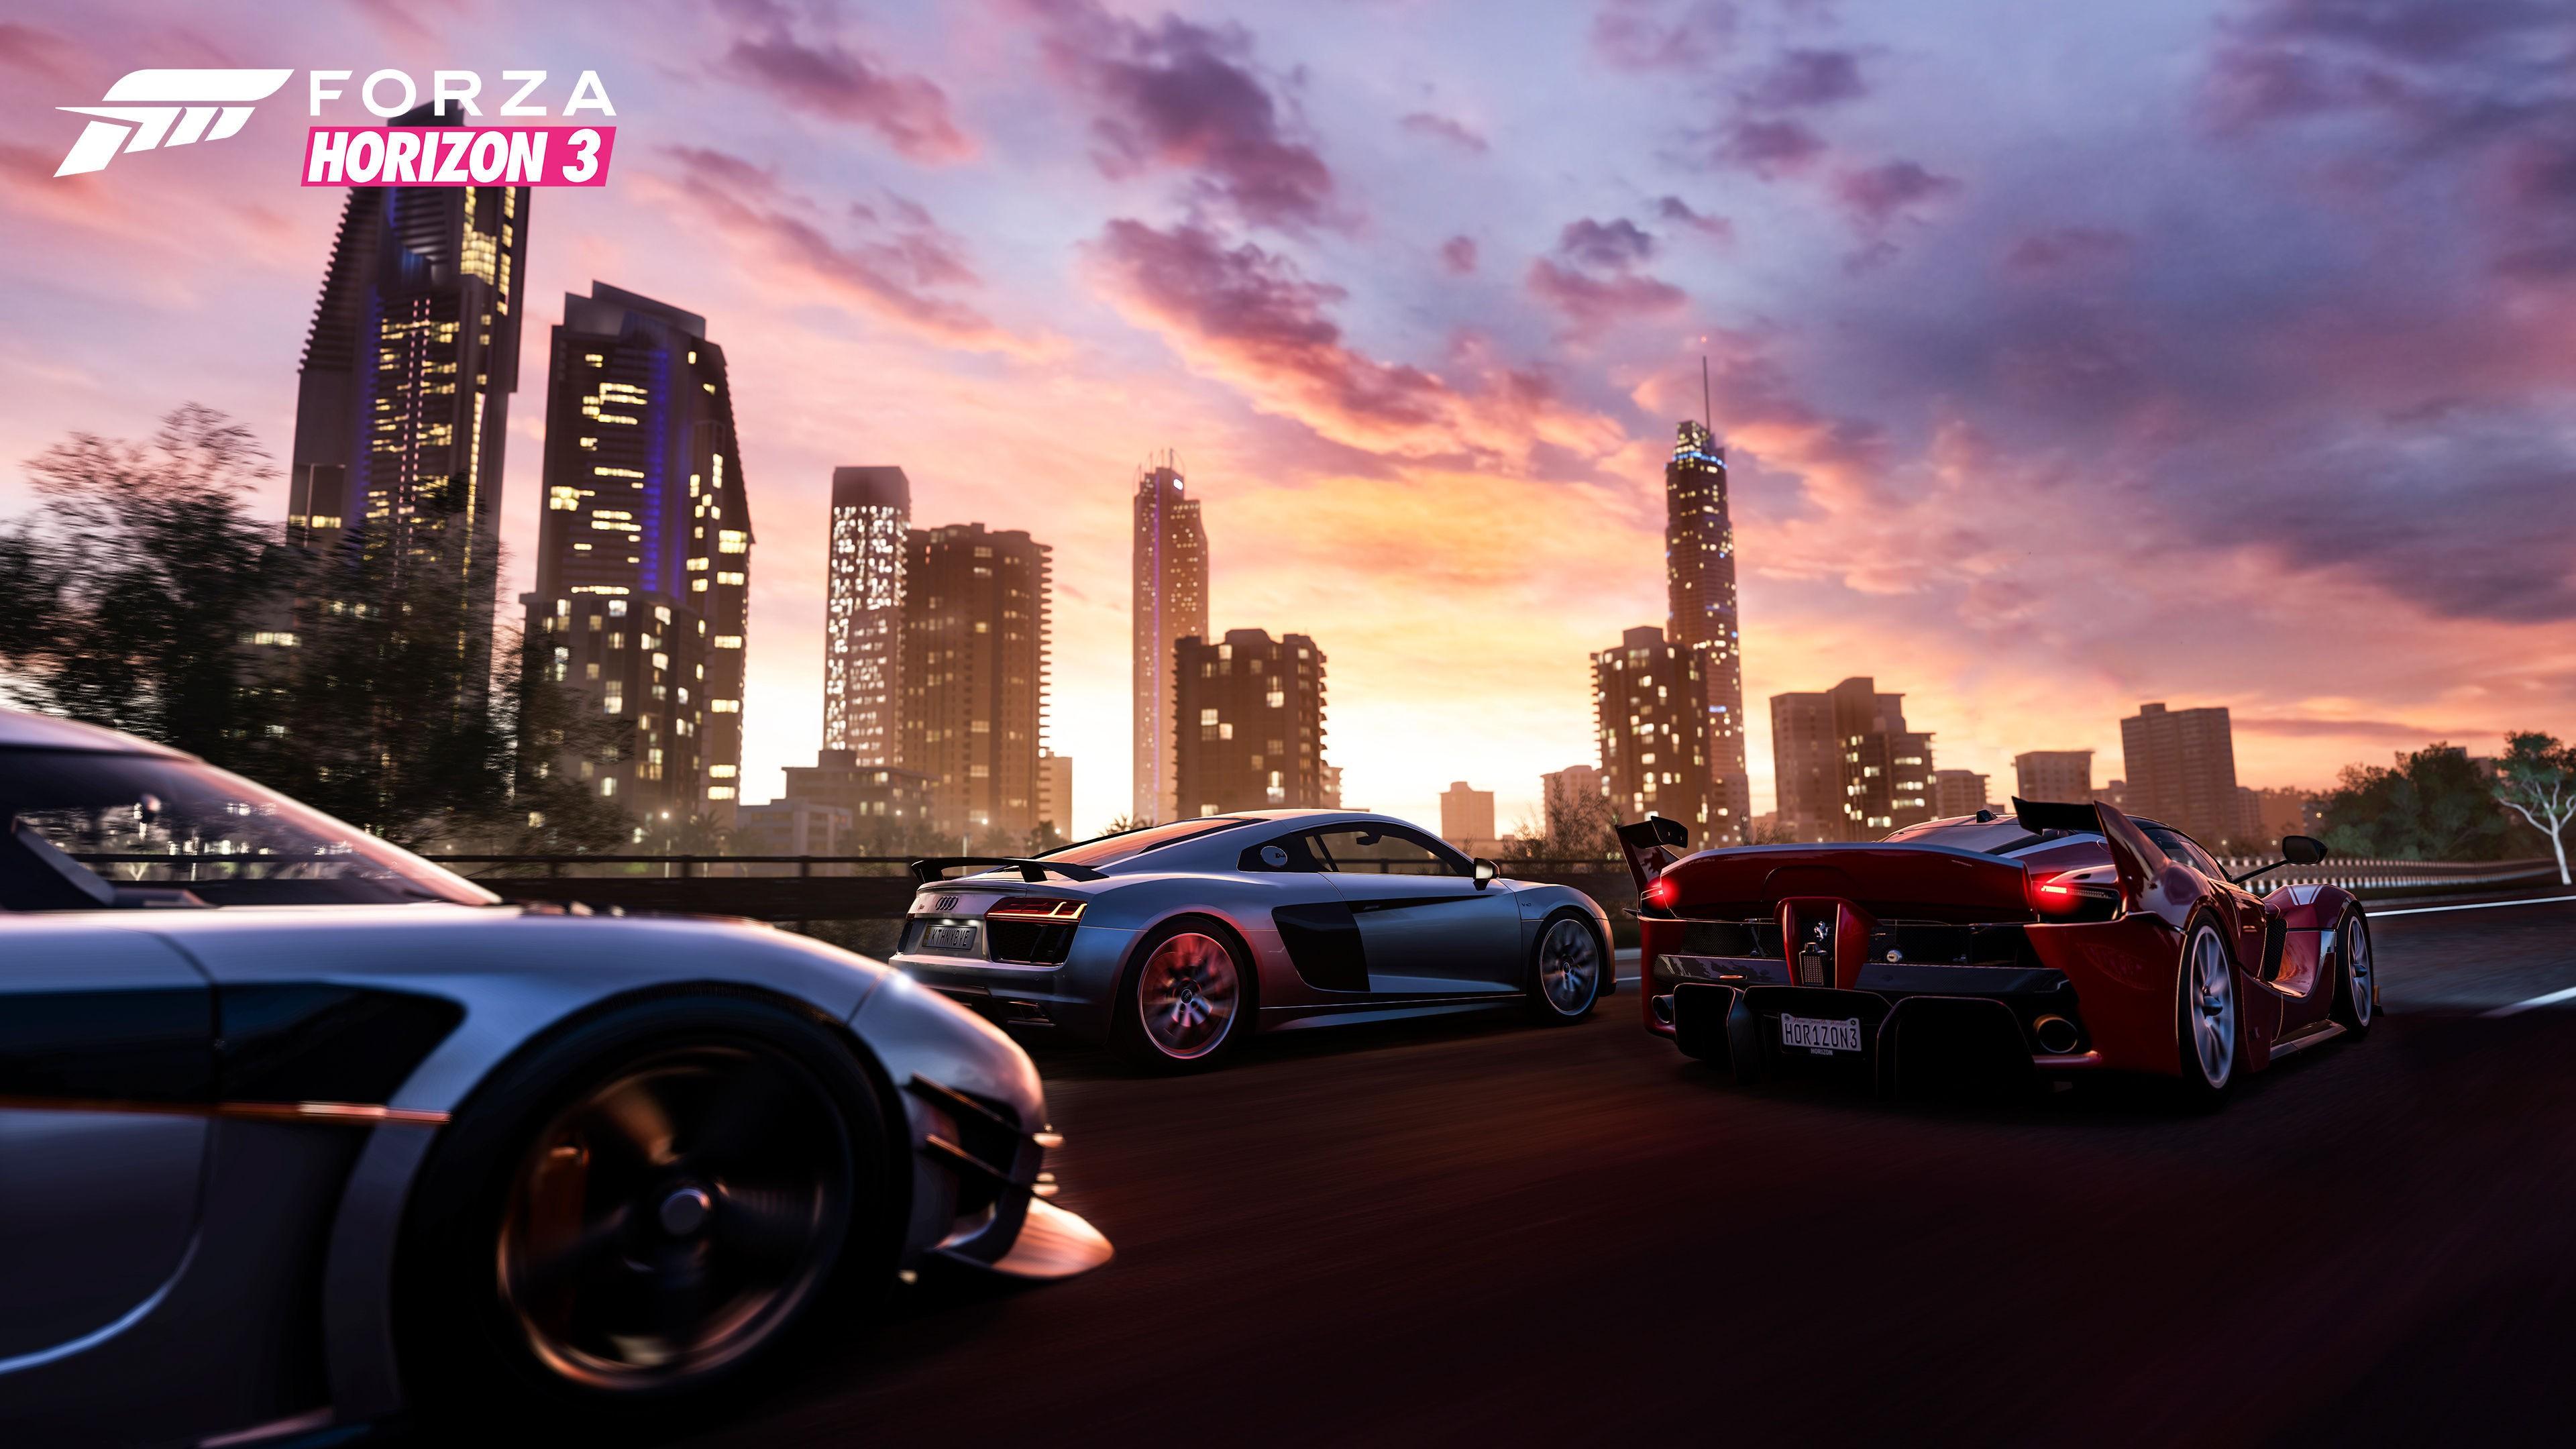 Wallpaper Forza Horizon 3 Racing Extreme E3 2016 Best Games